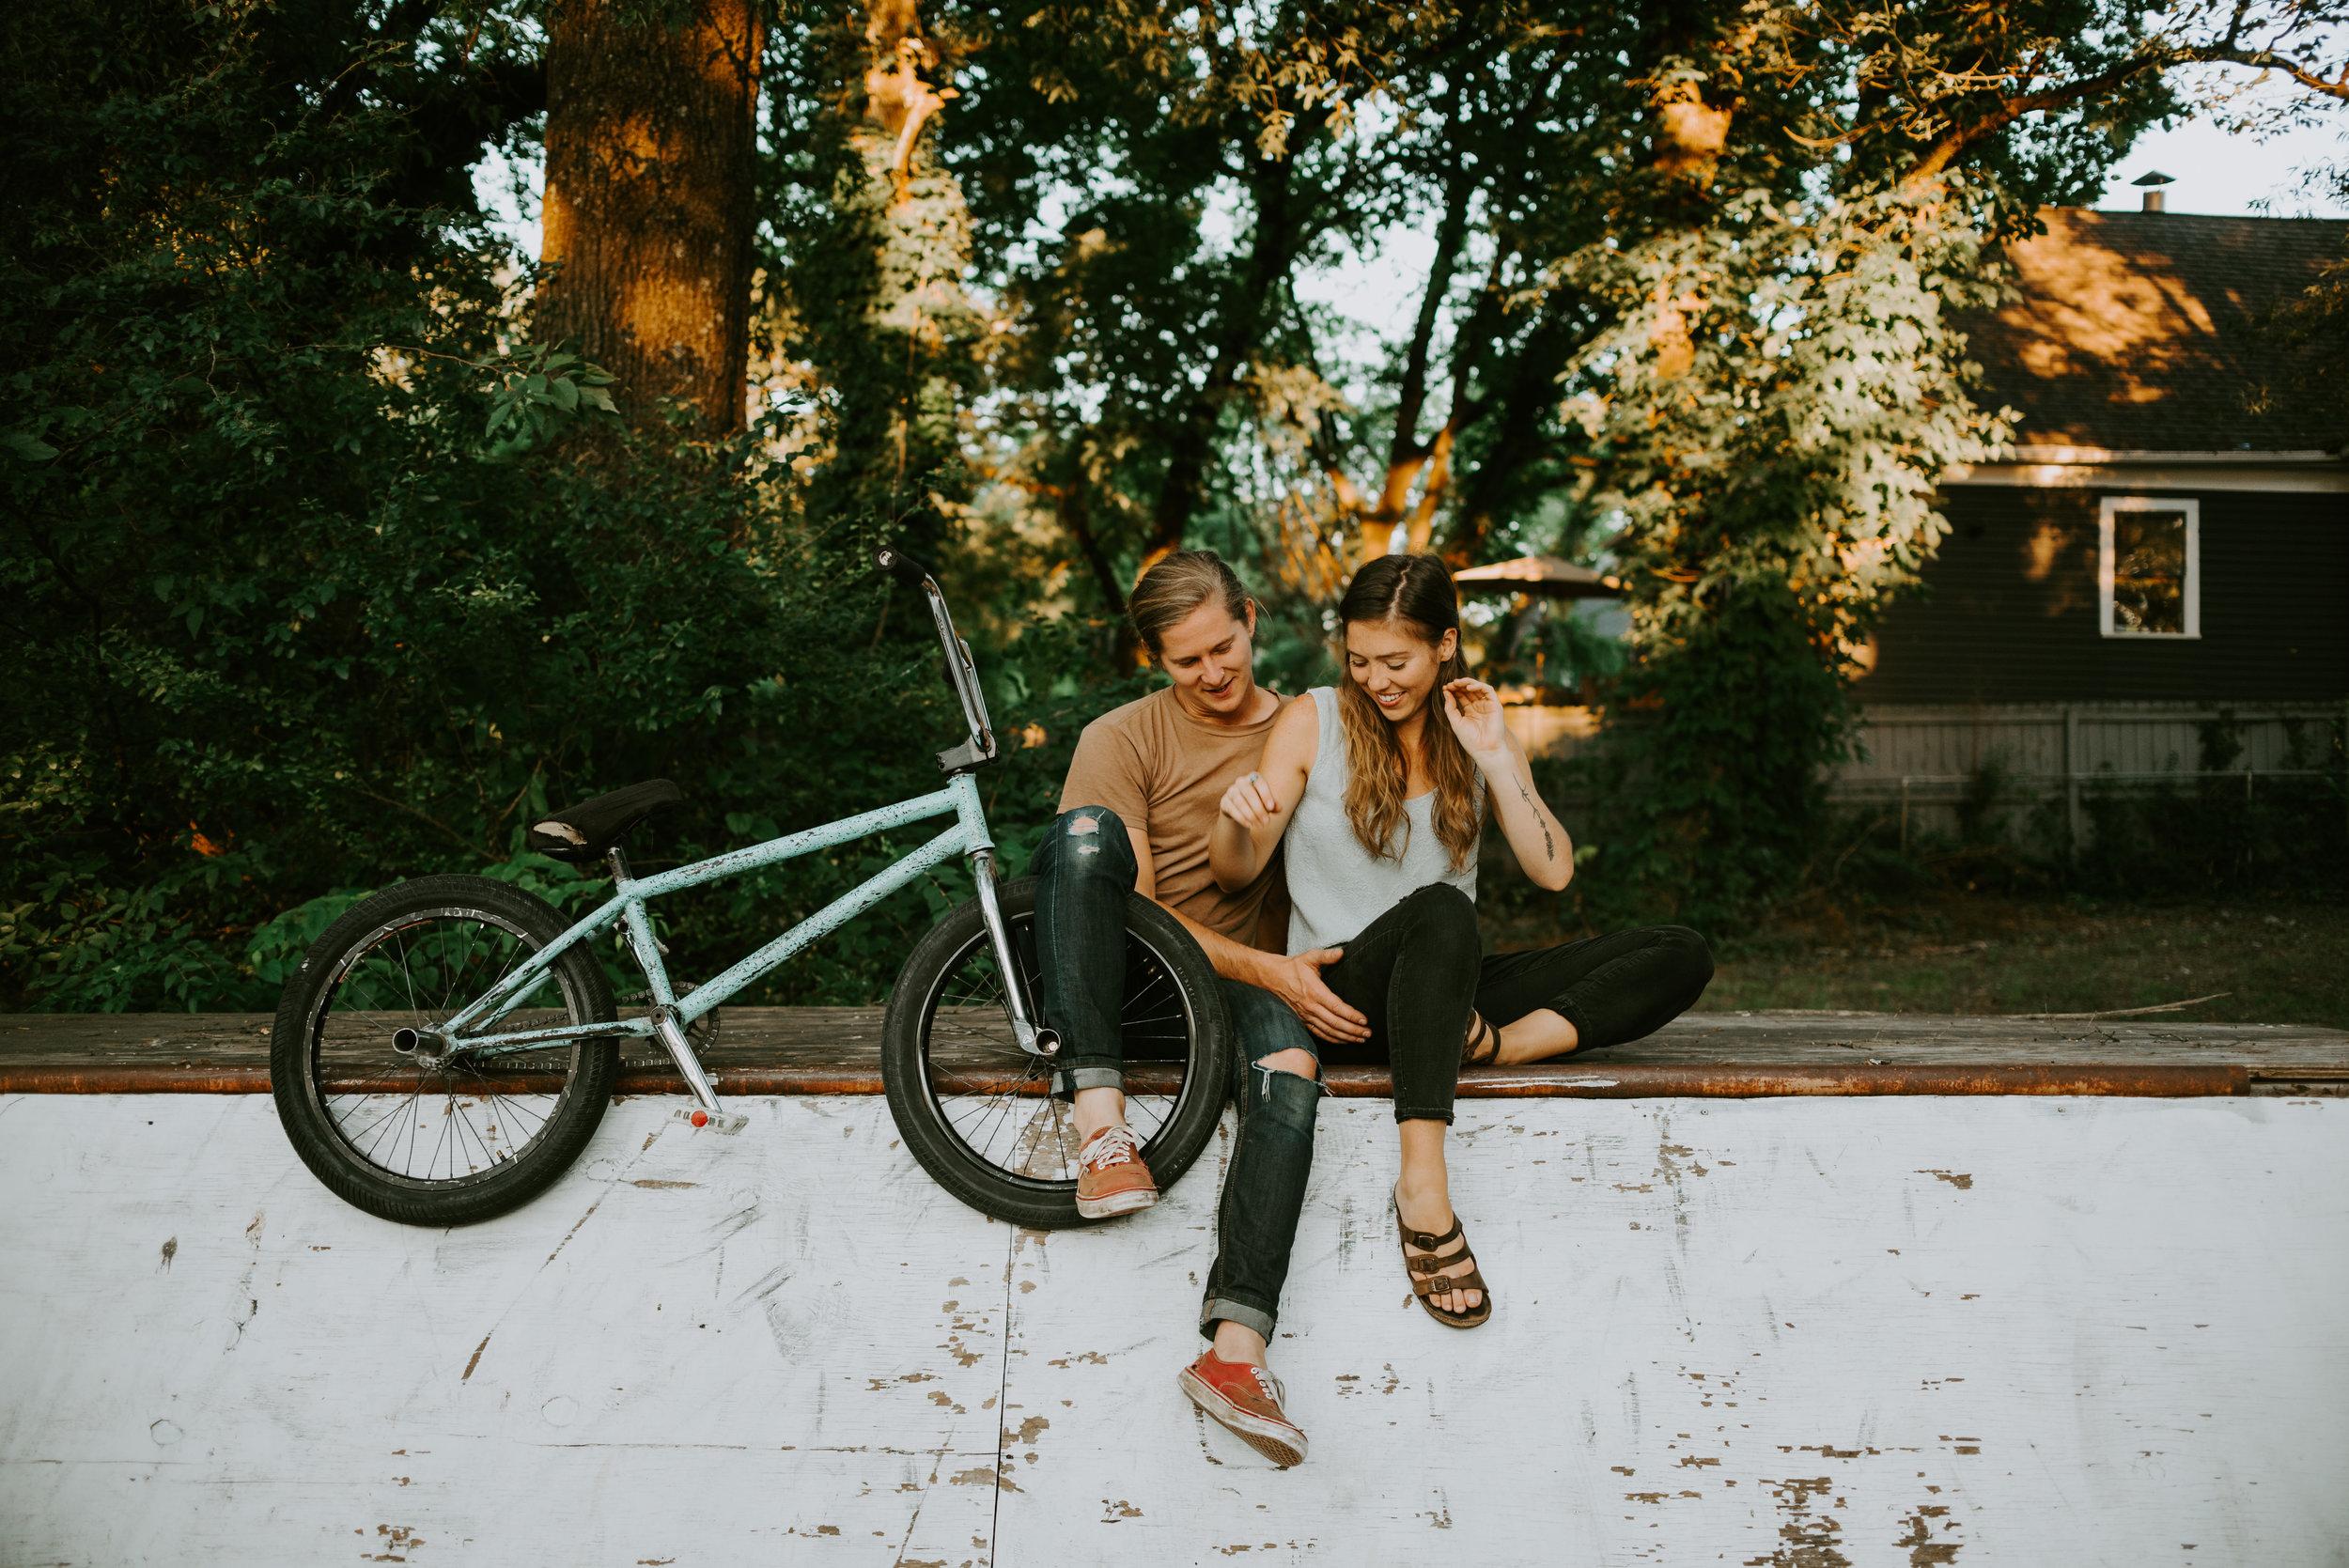 WonderlyCreative_Couples_7.9.18_Cameron&Alexis_-207.jpg